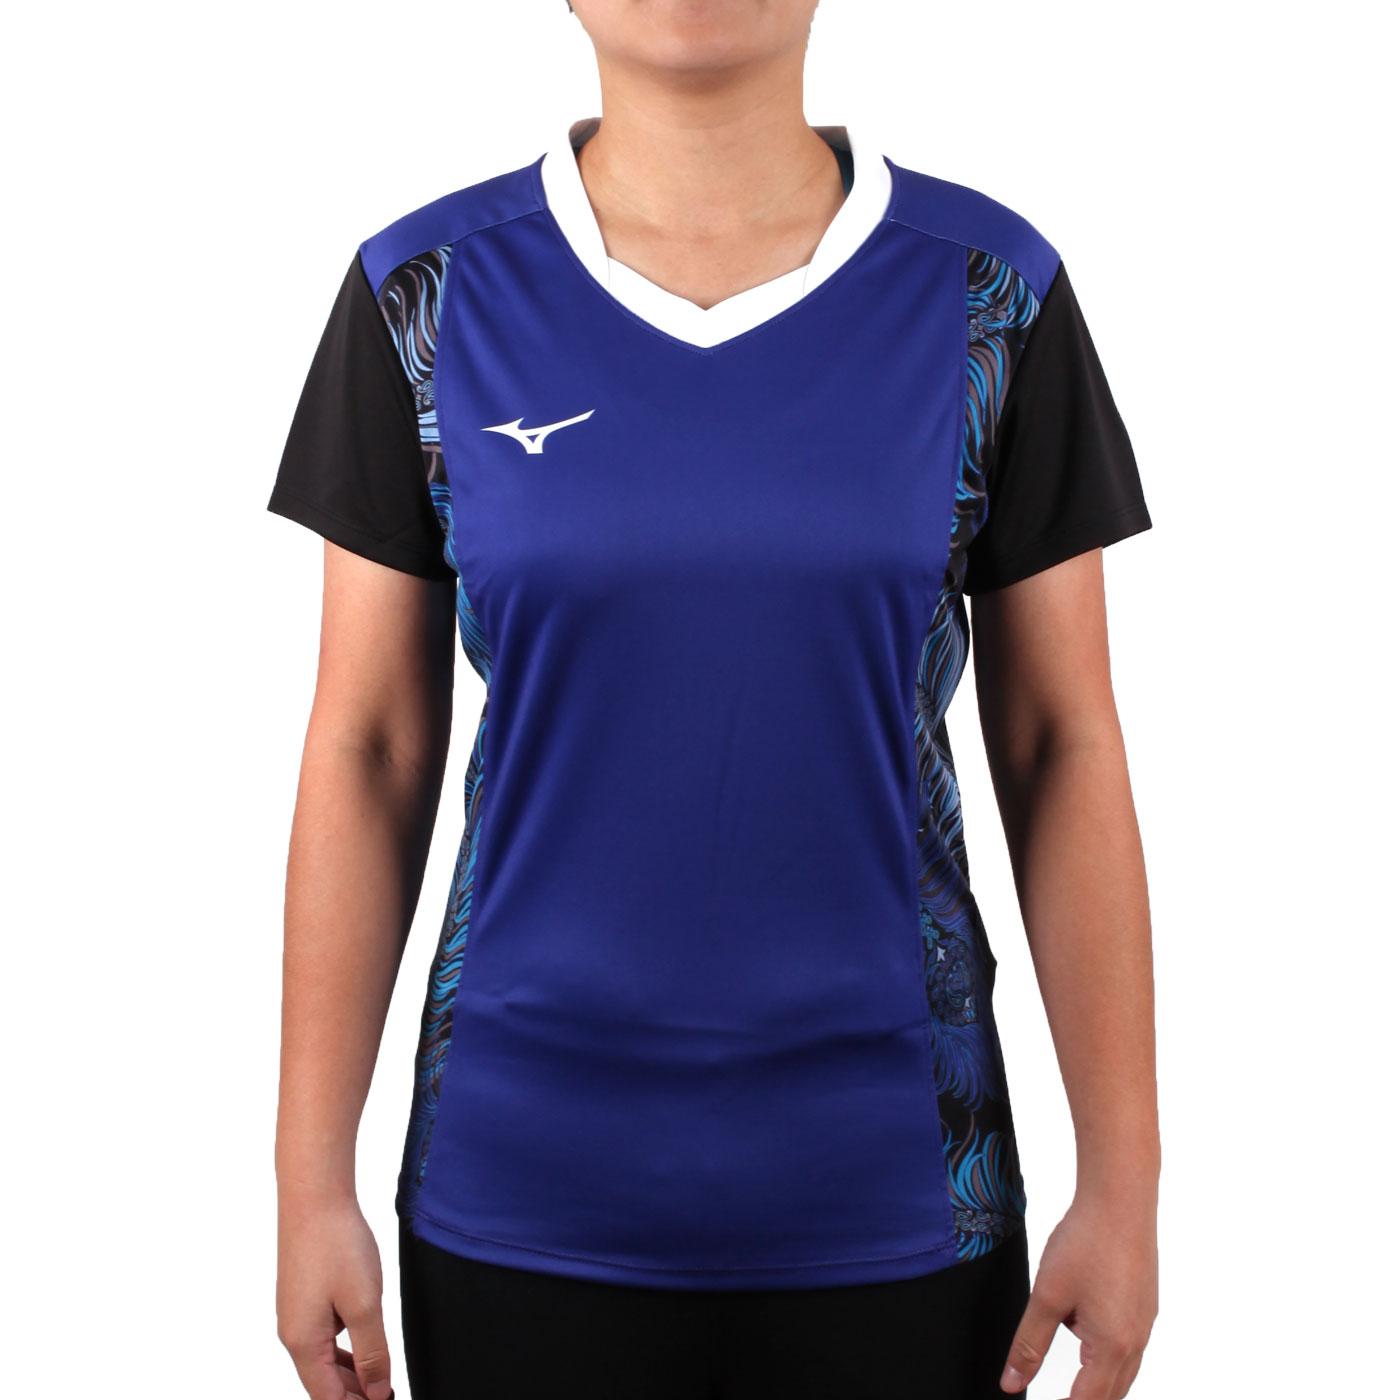 MIZUNO 女排球短袖上衣(2017企業排球聯賽) V2TA7C2901D - 藍白黑